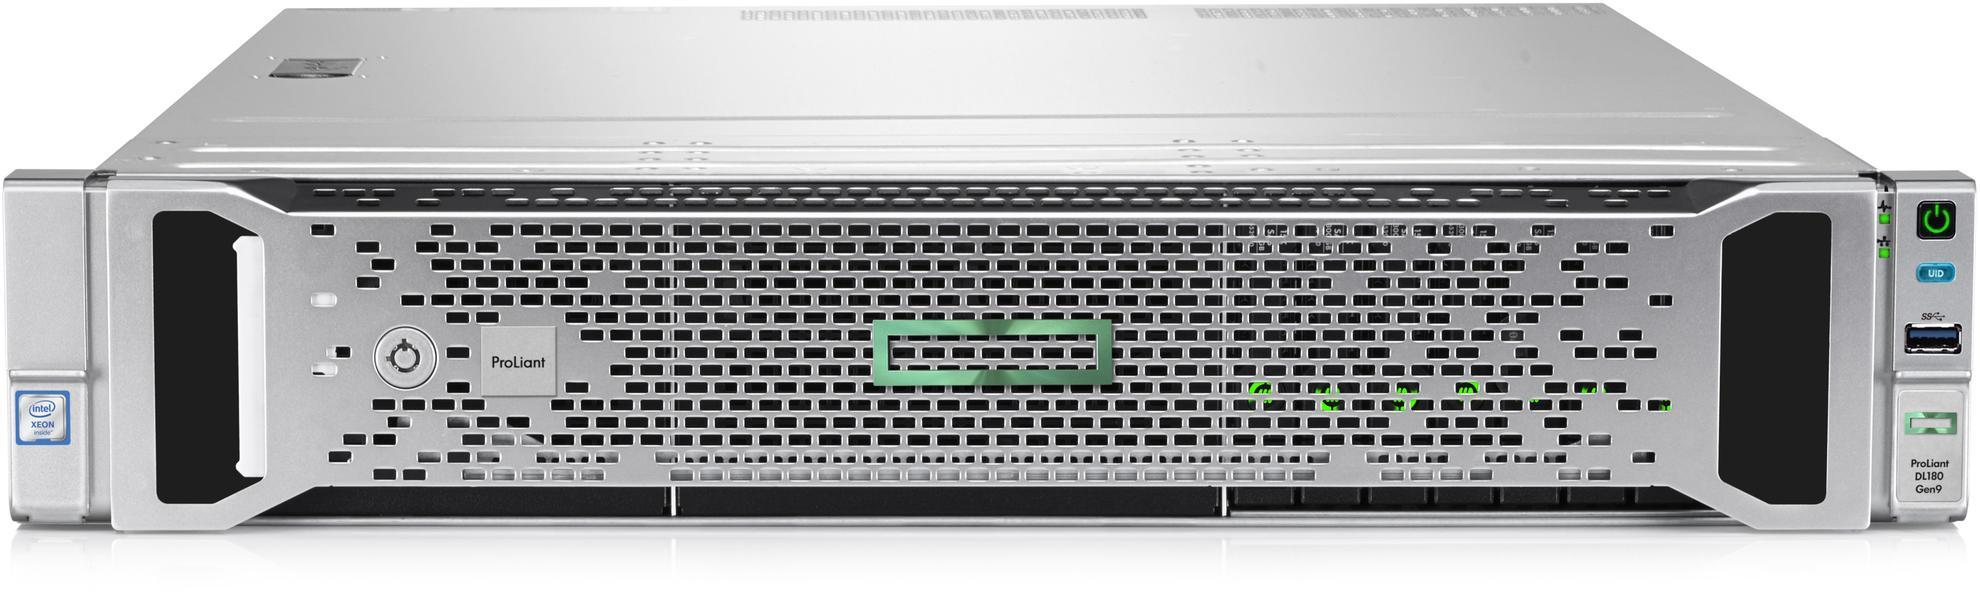 Сервер Proliant DL180 Gen9 E5-2609v4 Hot Plug Rack(2U)/Xeon8C 1.7GHz(20Mb)/1x8GbR1D_2400/H240(ZM/RAI